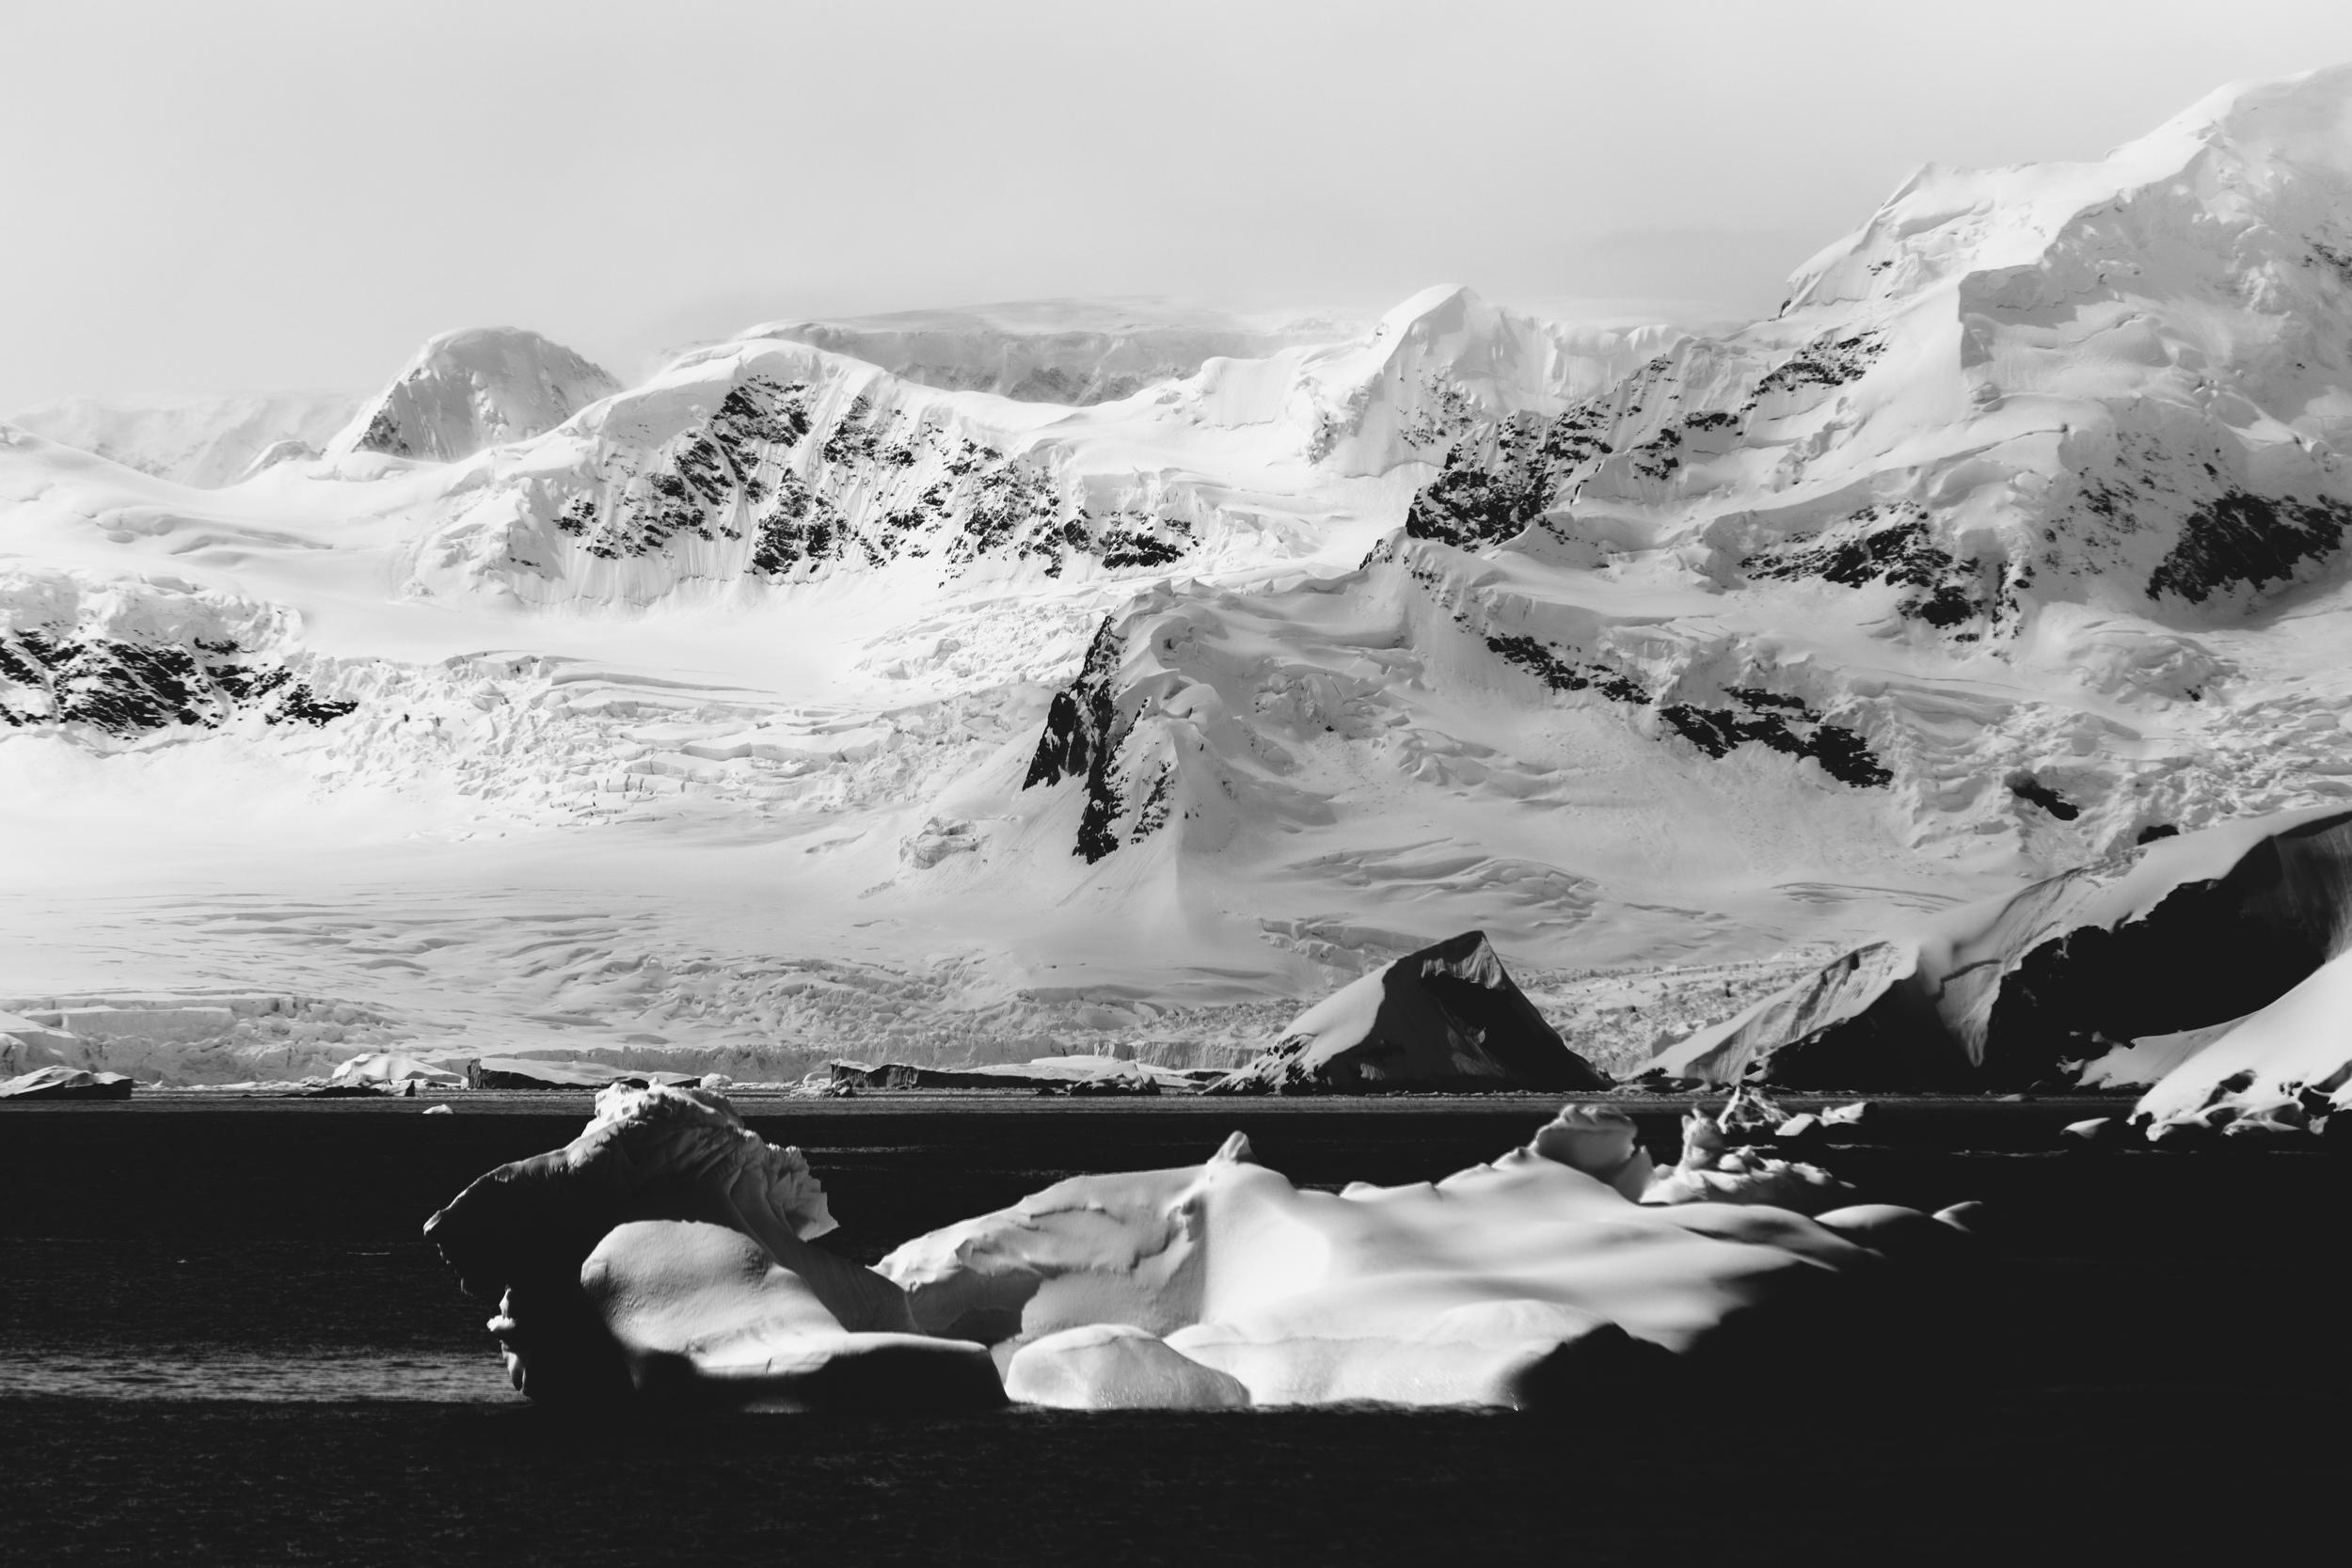 aqm-antarctica-noir-16.jpg